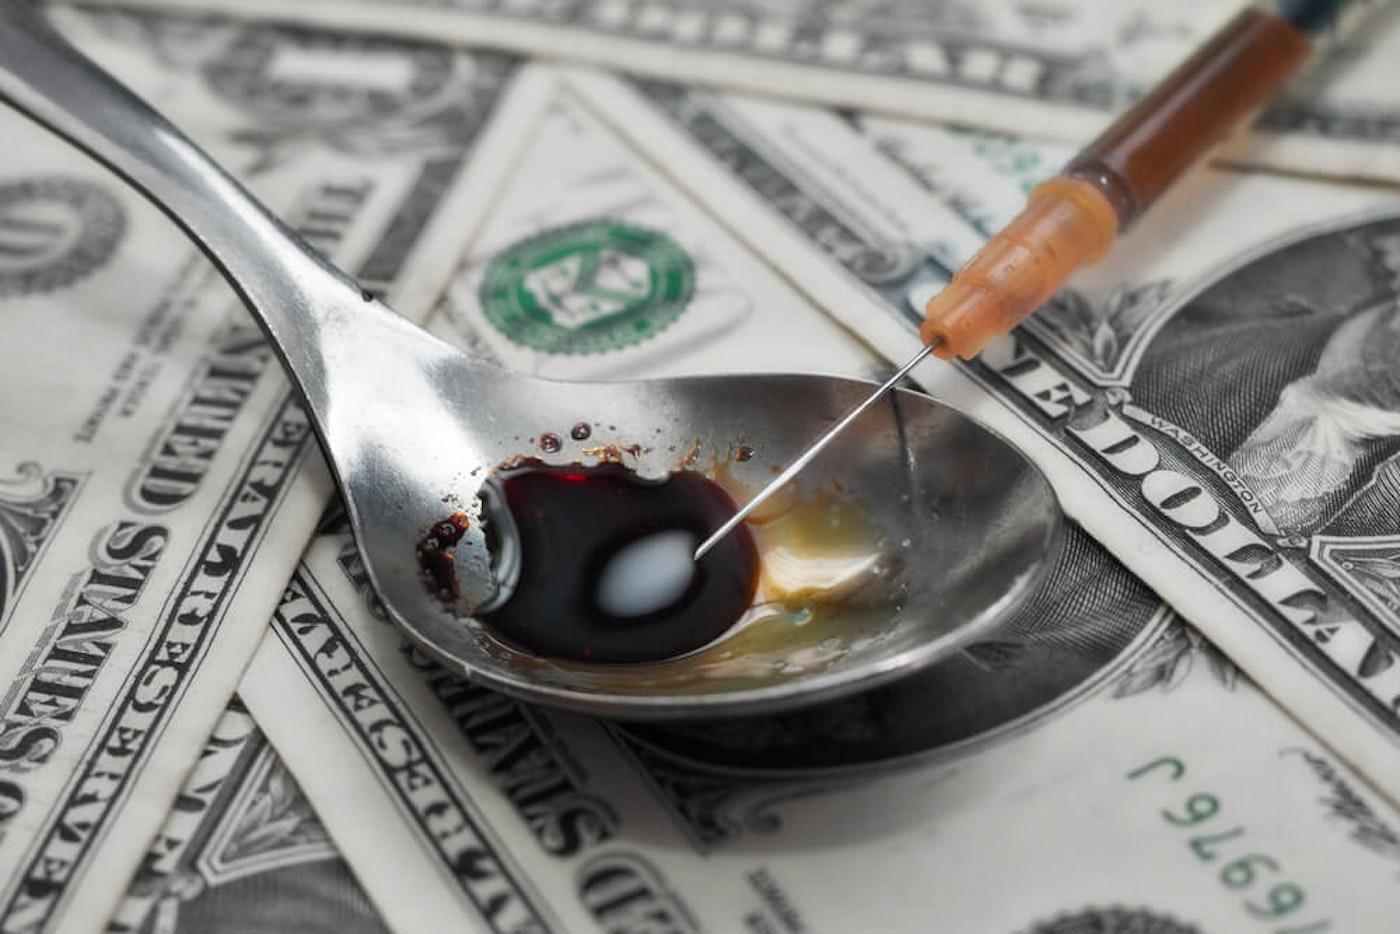 Methamphetamine injection|Stock Photo